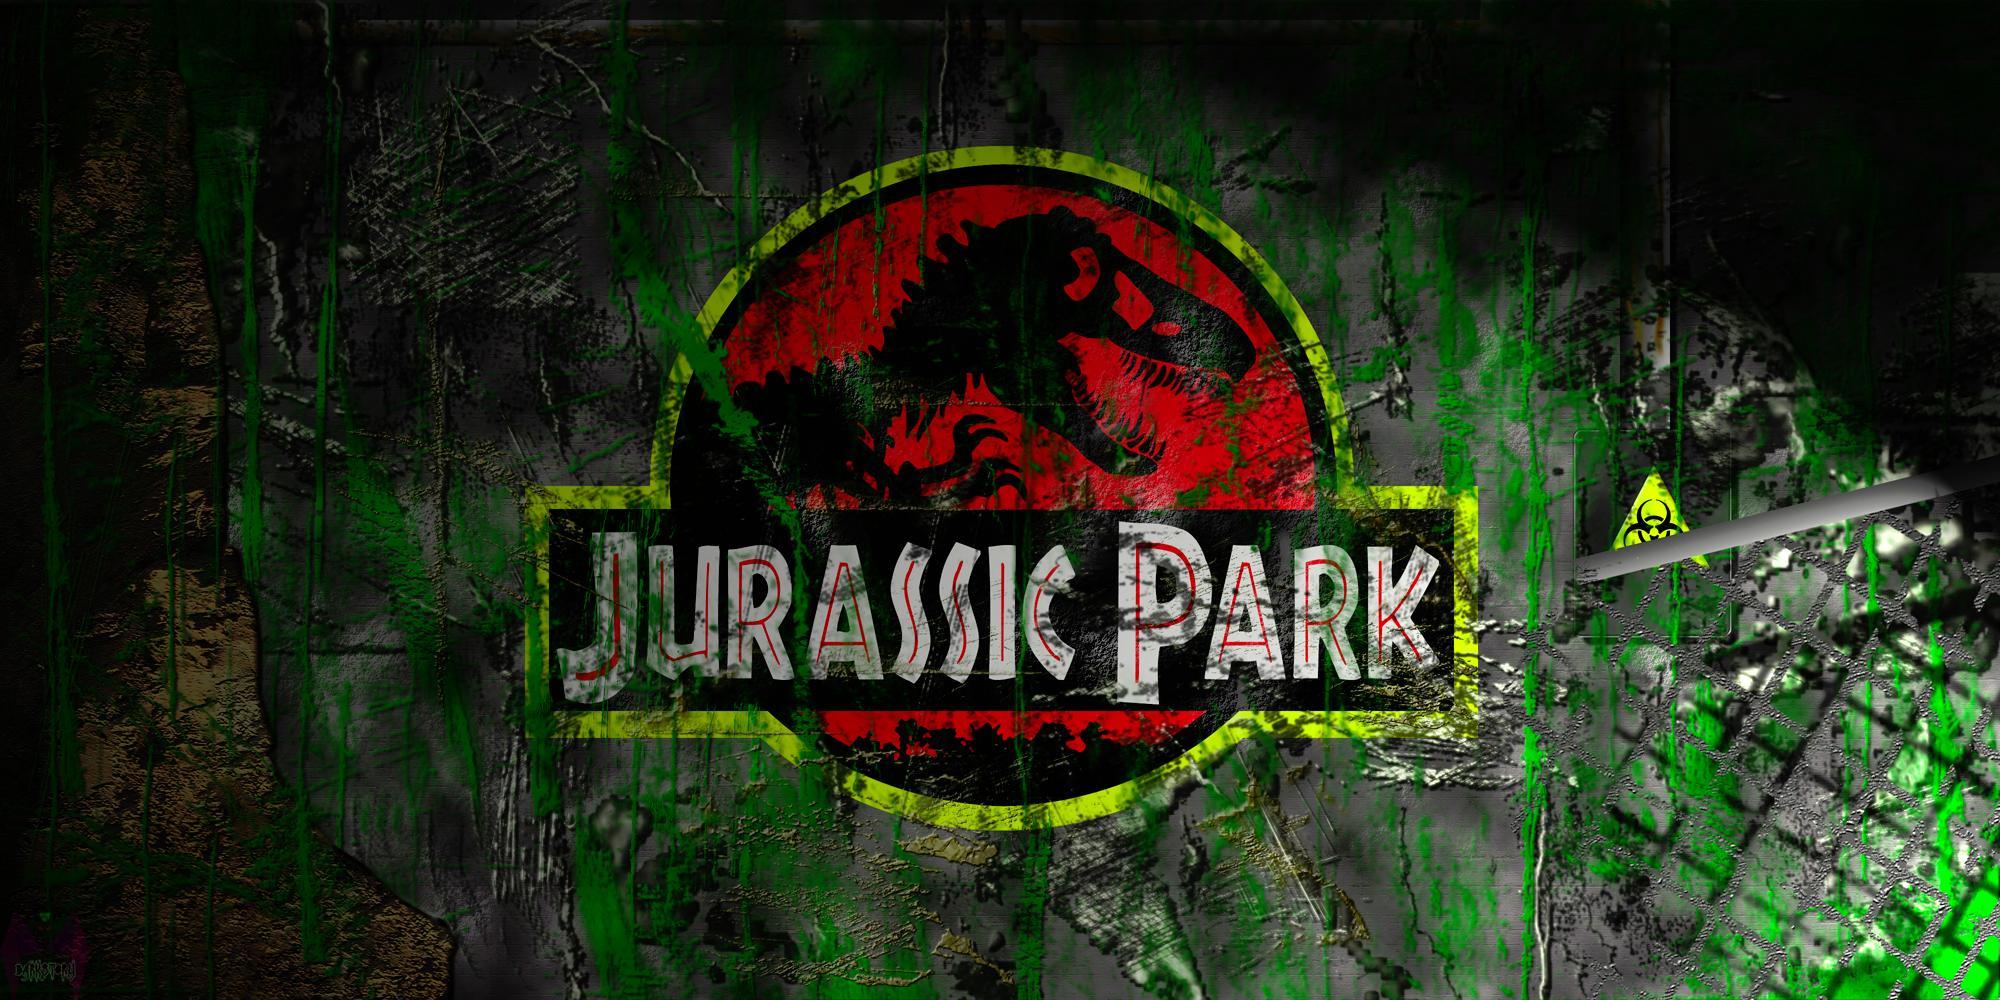 Add media Report RSS Jurassic Park Wallpaper (view original)